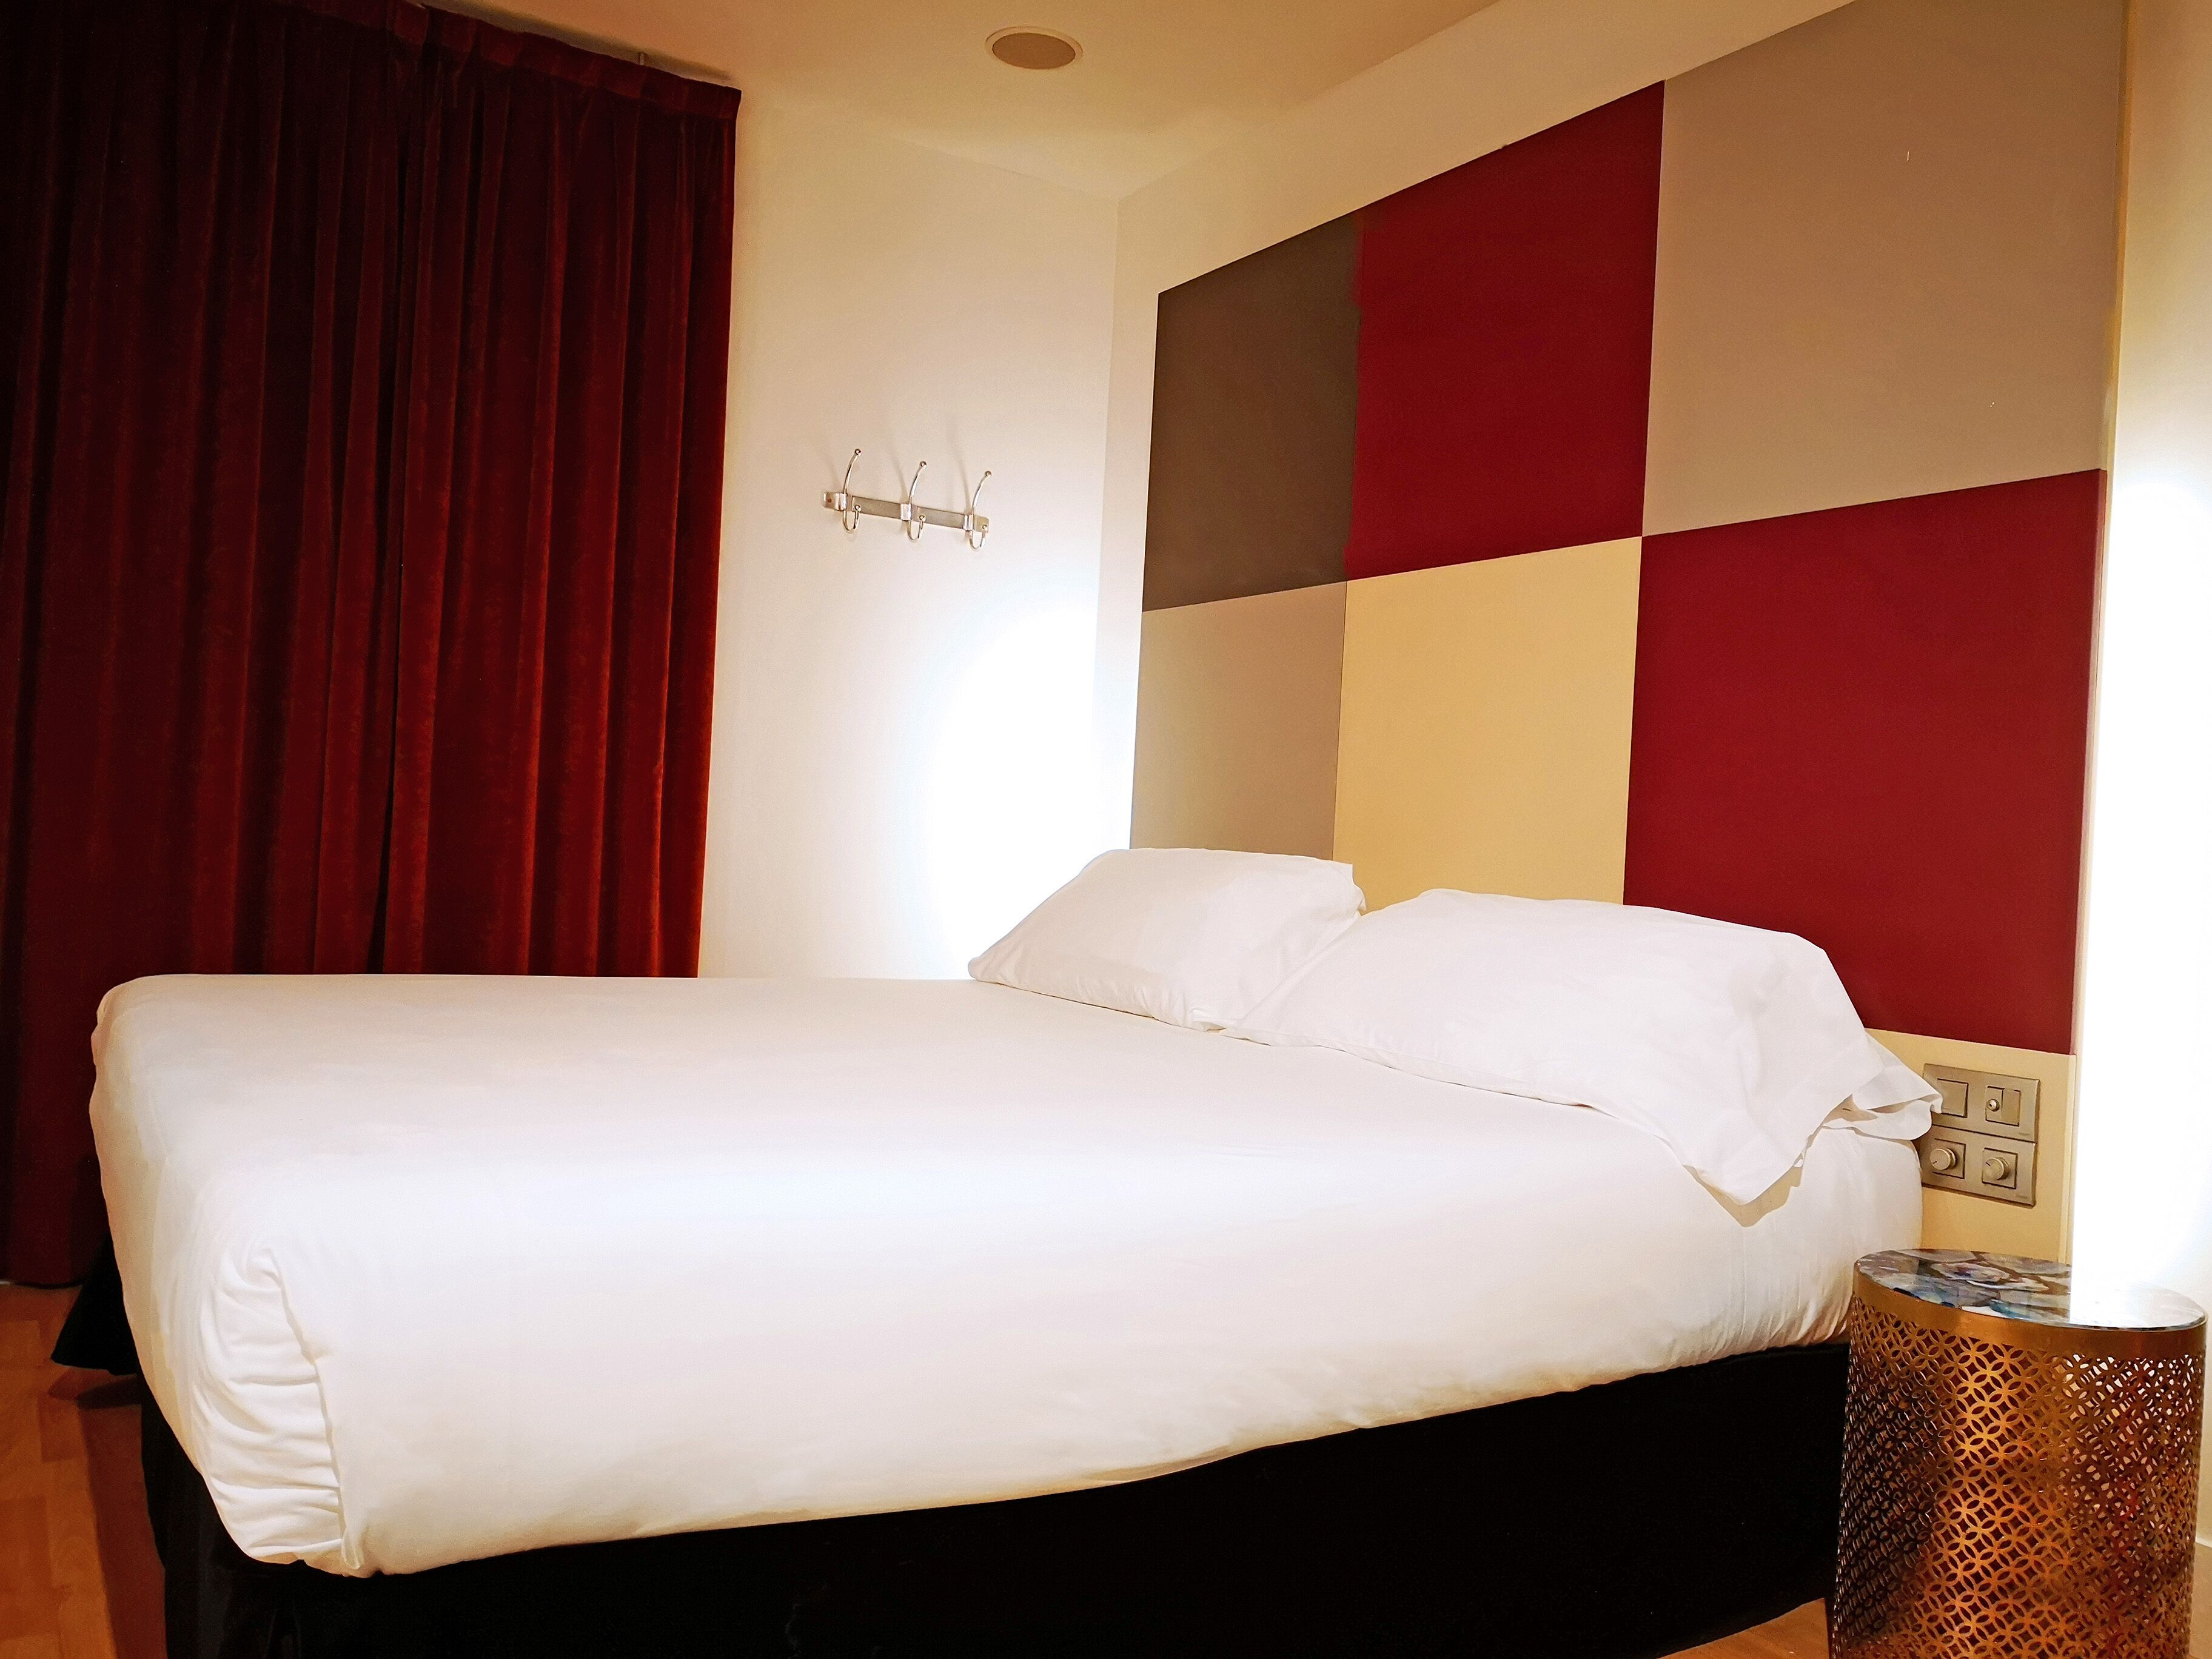 H La Paloma Love Hotel - Adults Only